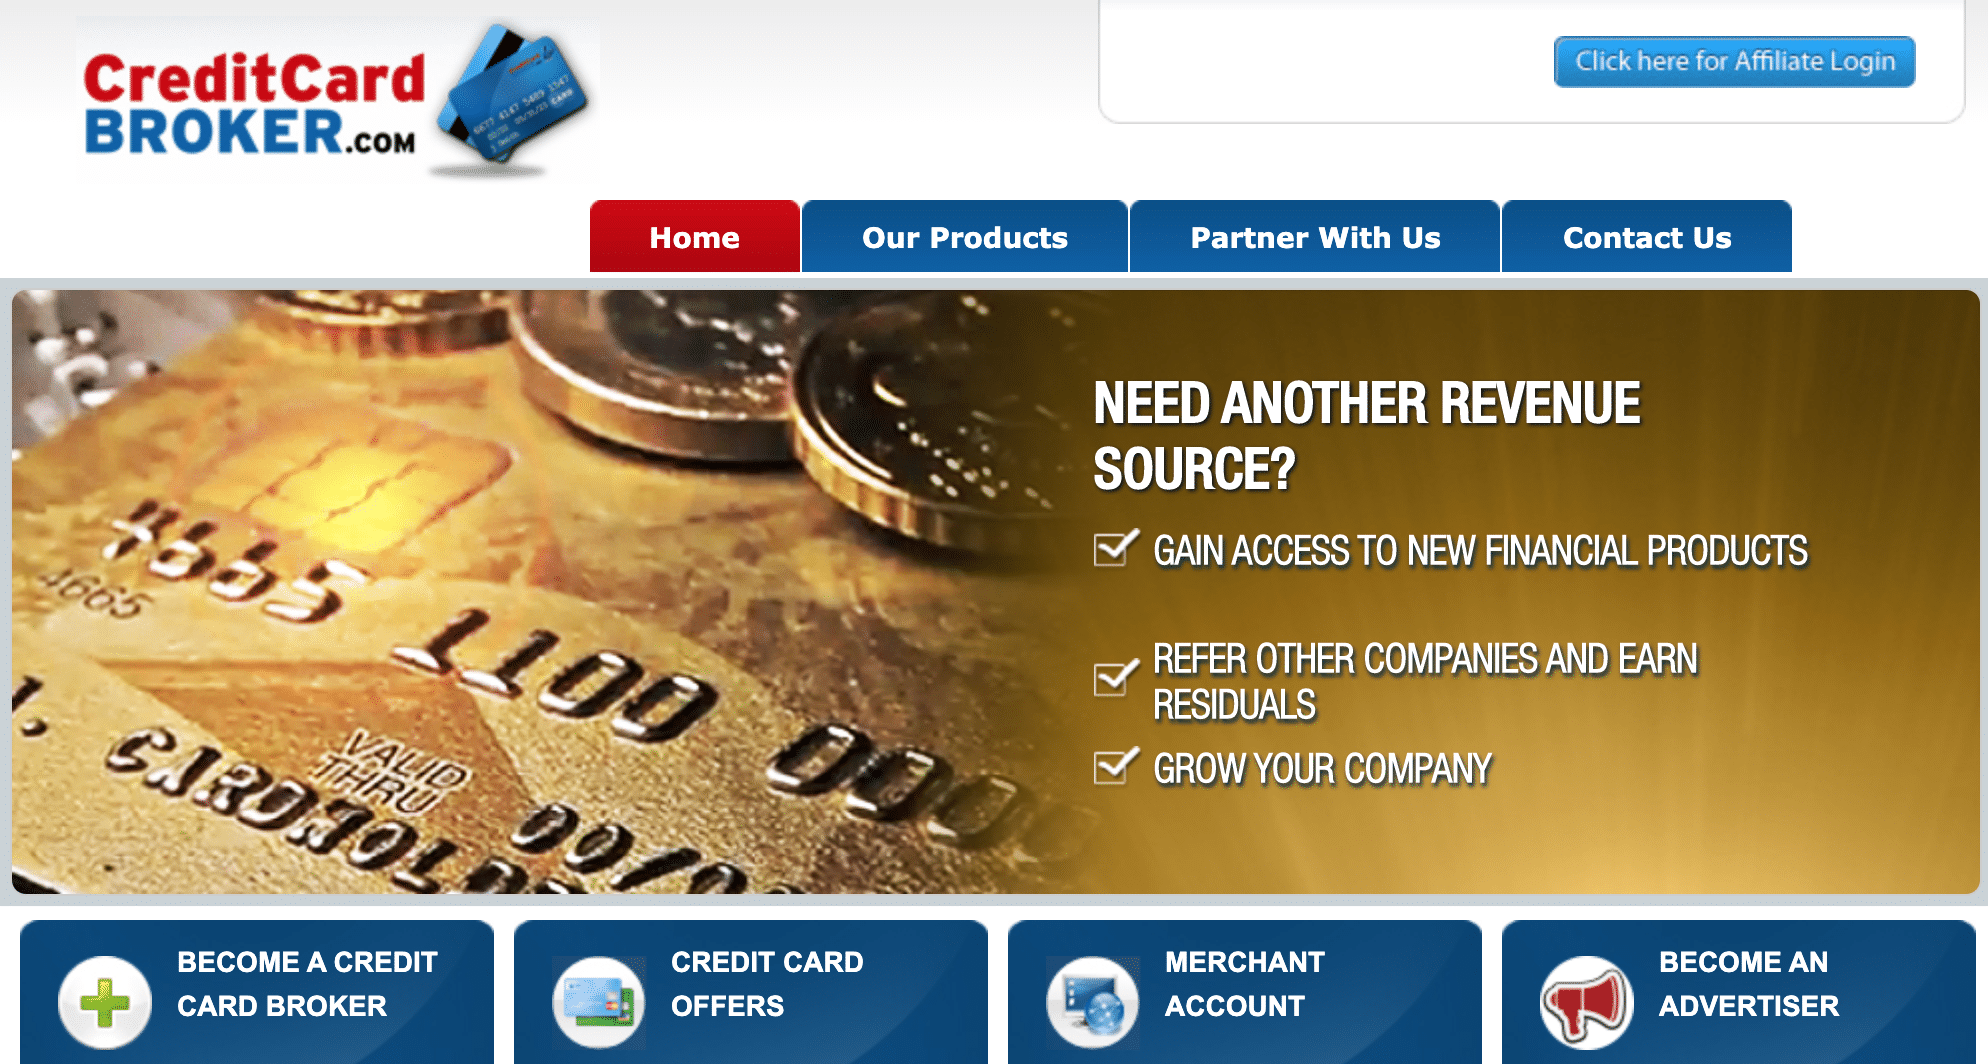 Best credit card affiliate program - CreditCardBroker.com